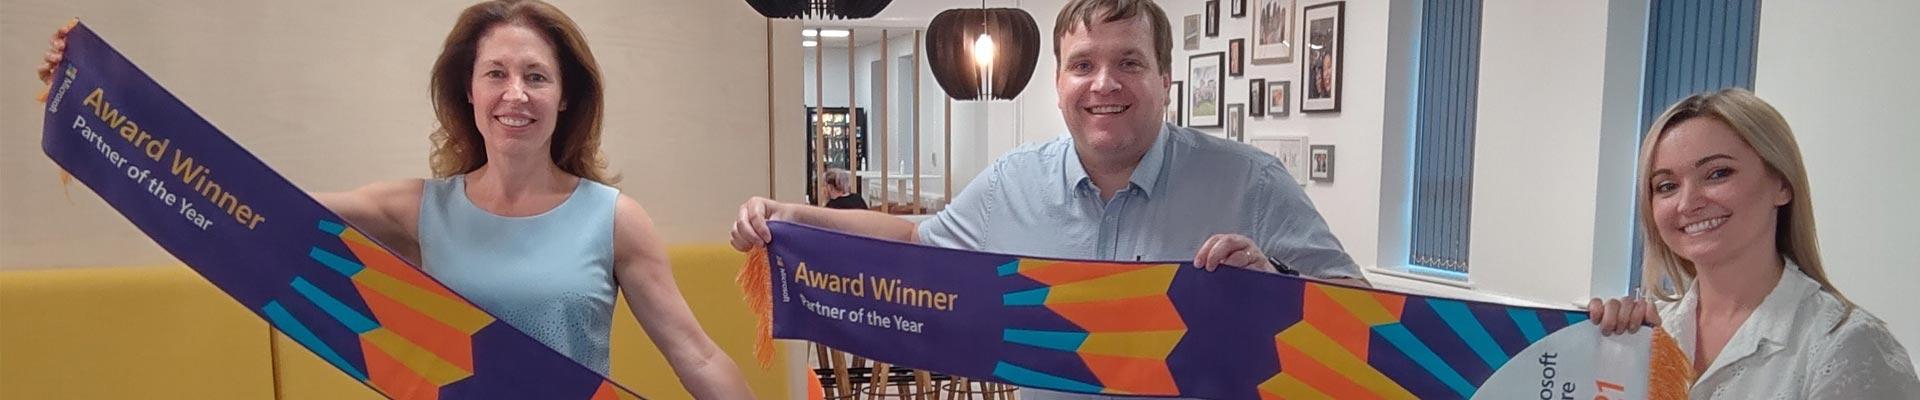 Phoenix wins Microsoft Partner of the Year 2021